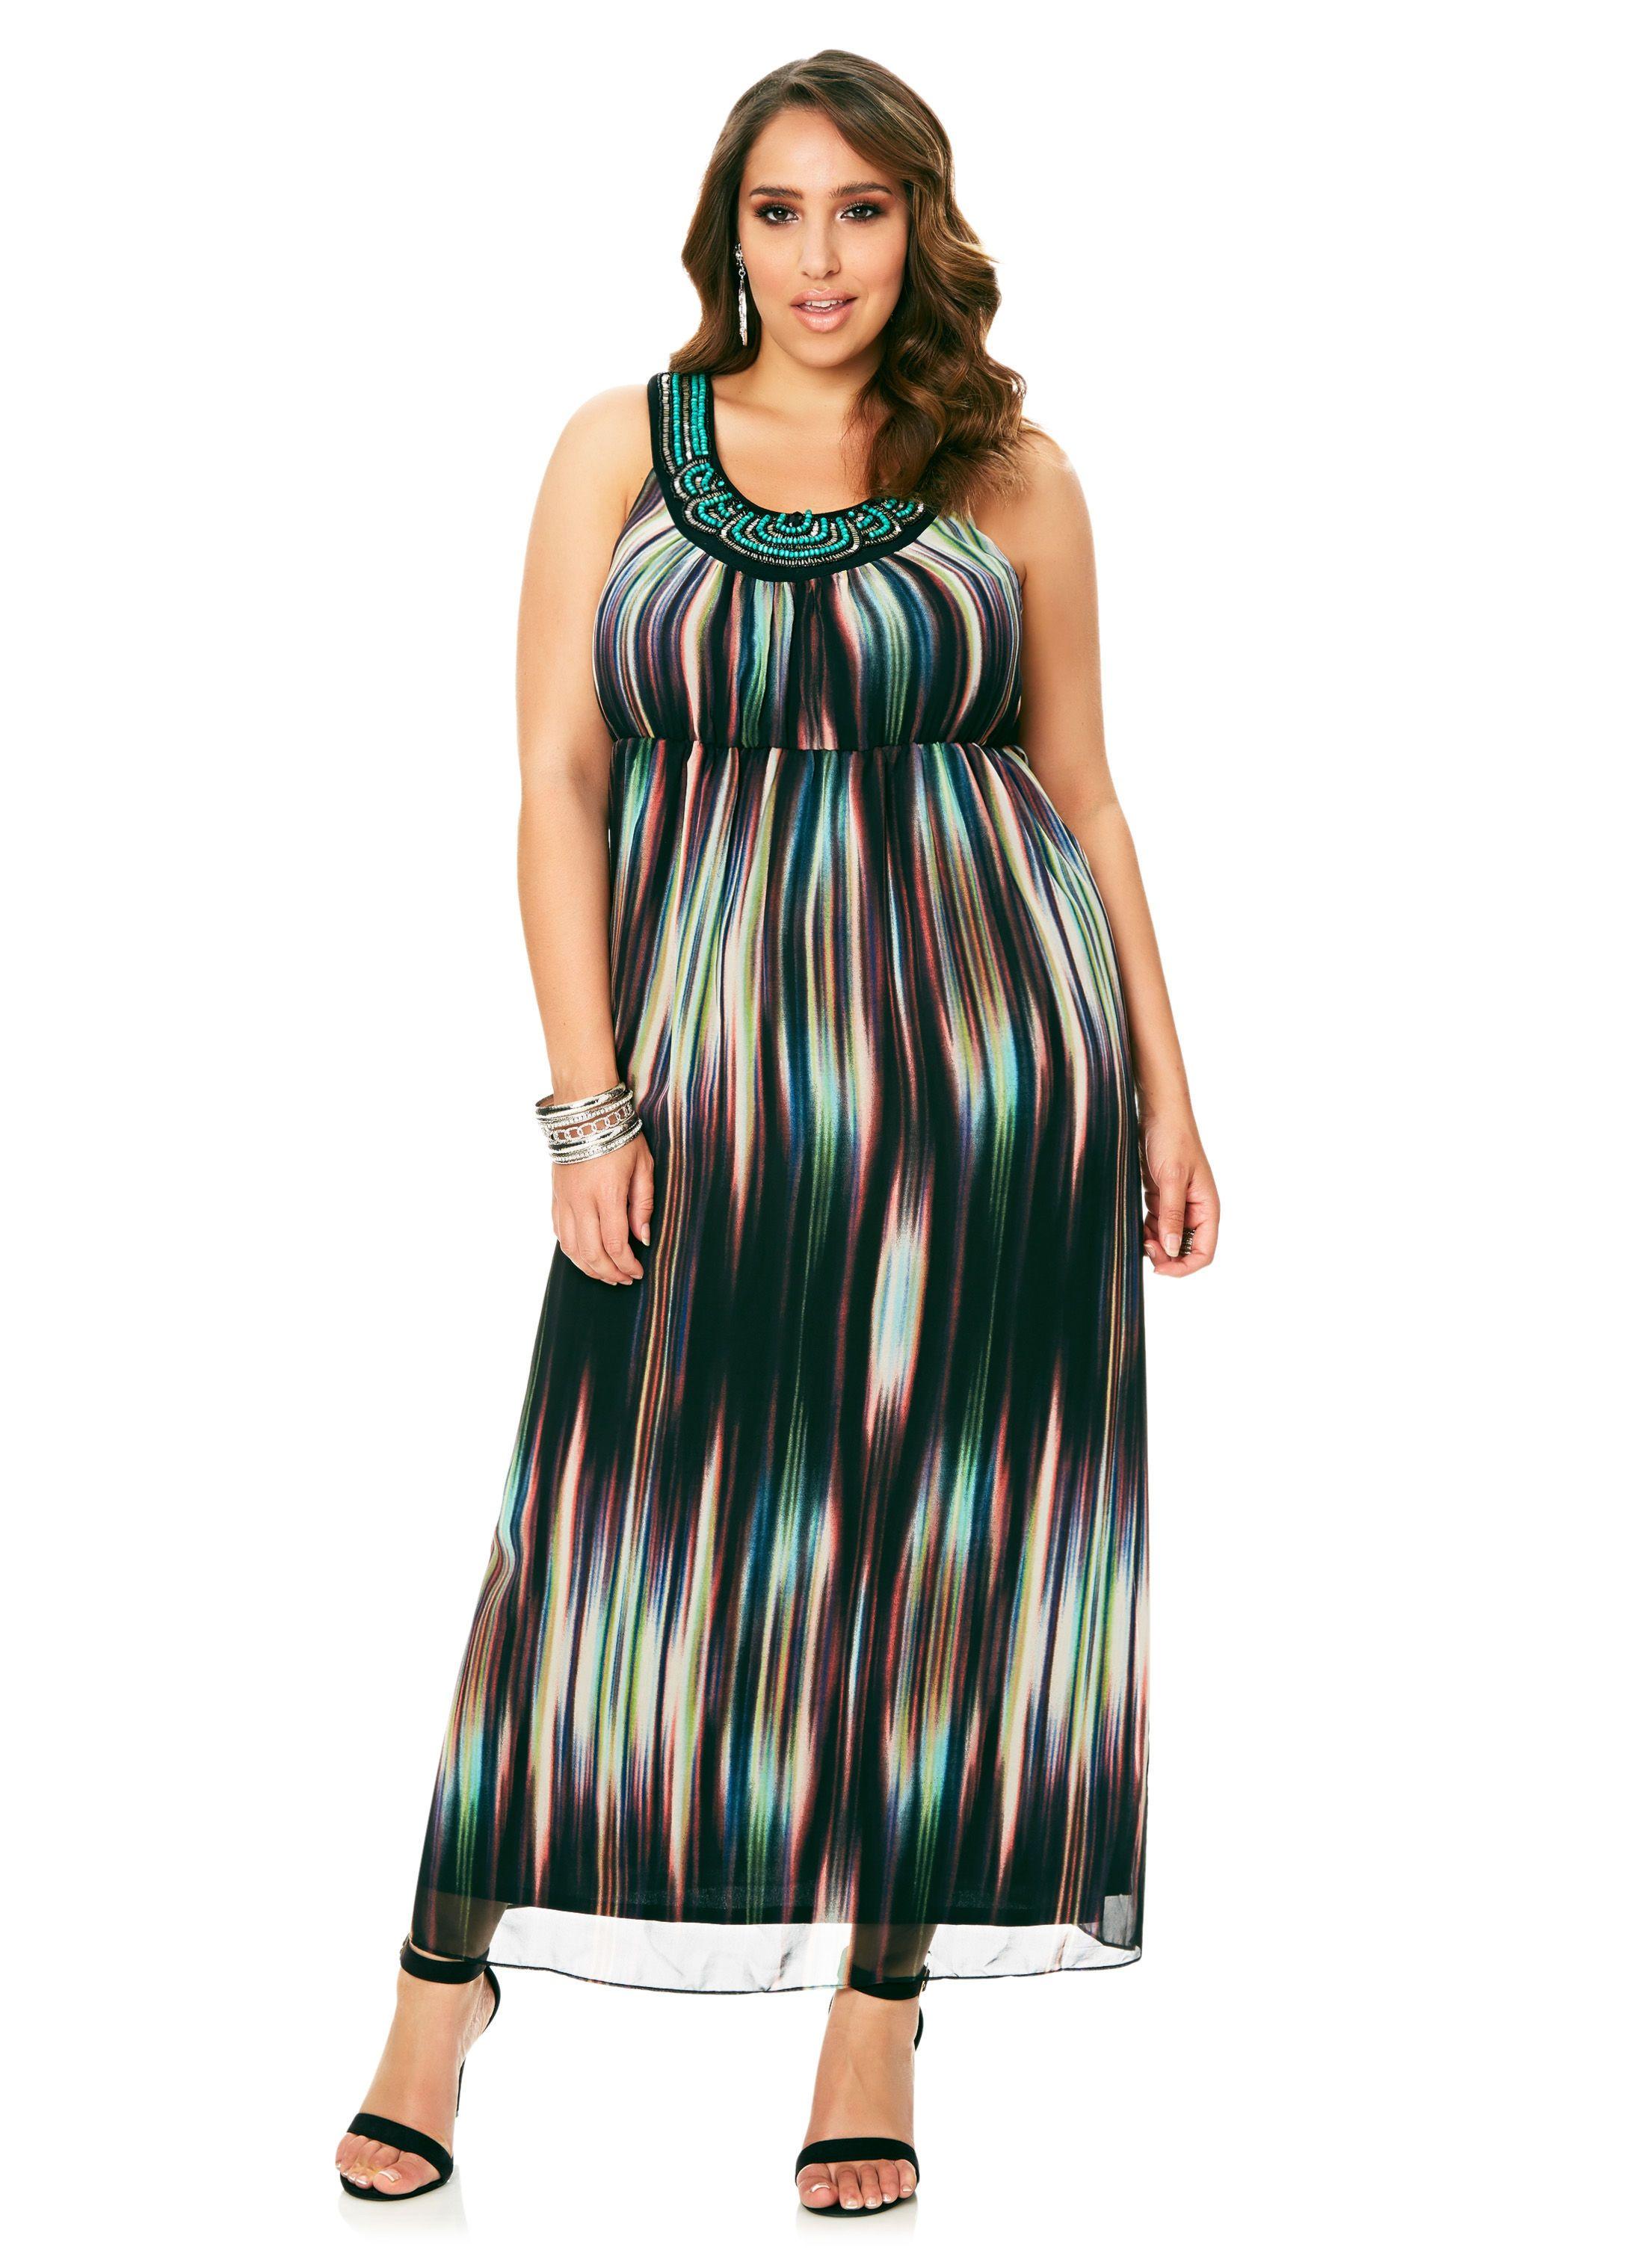 2487fcc31201d Beaded Neck Watercolor Maxi Dress - Ashley Stewart